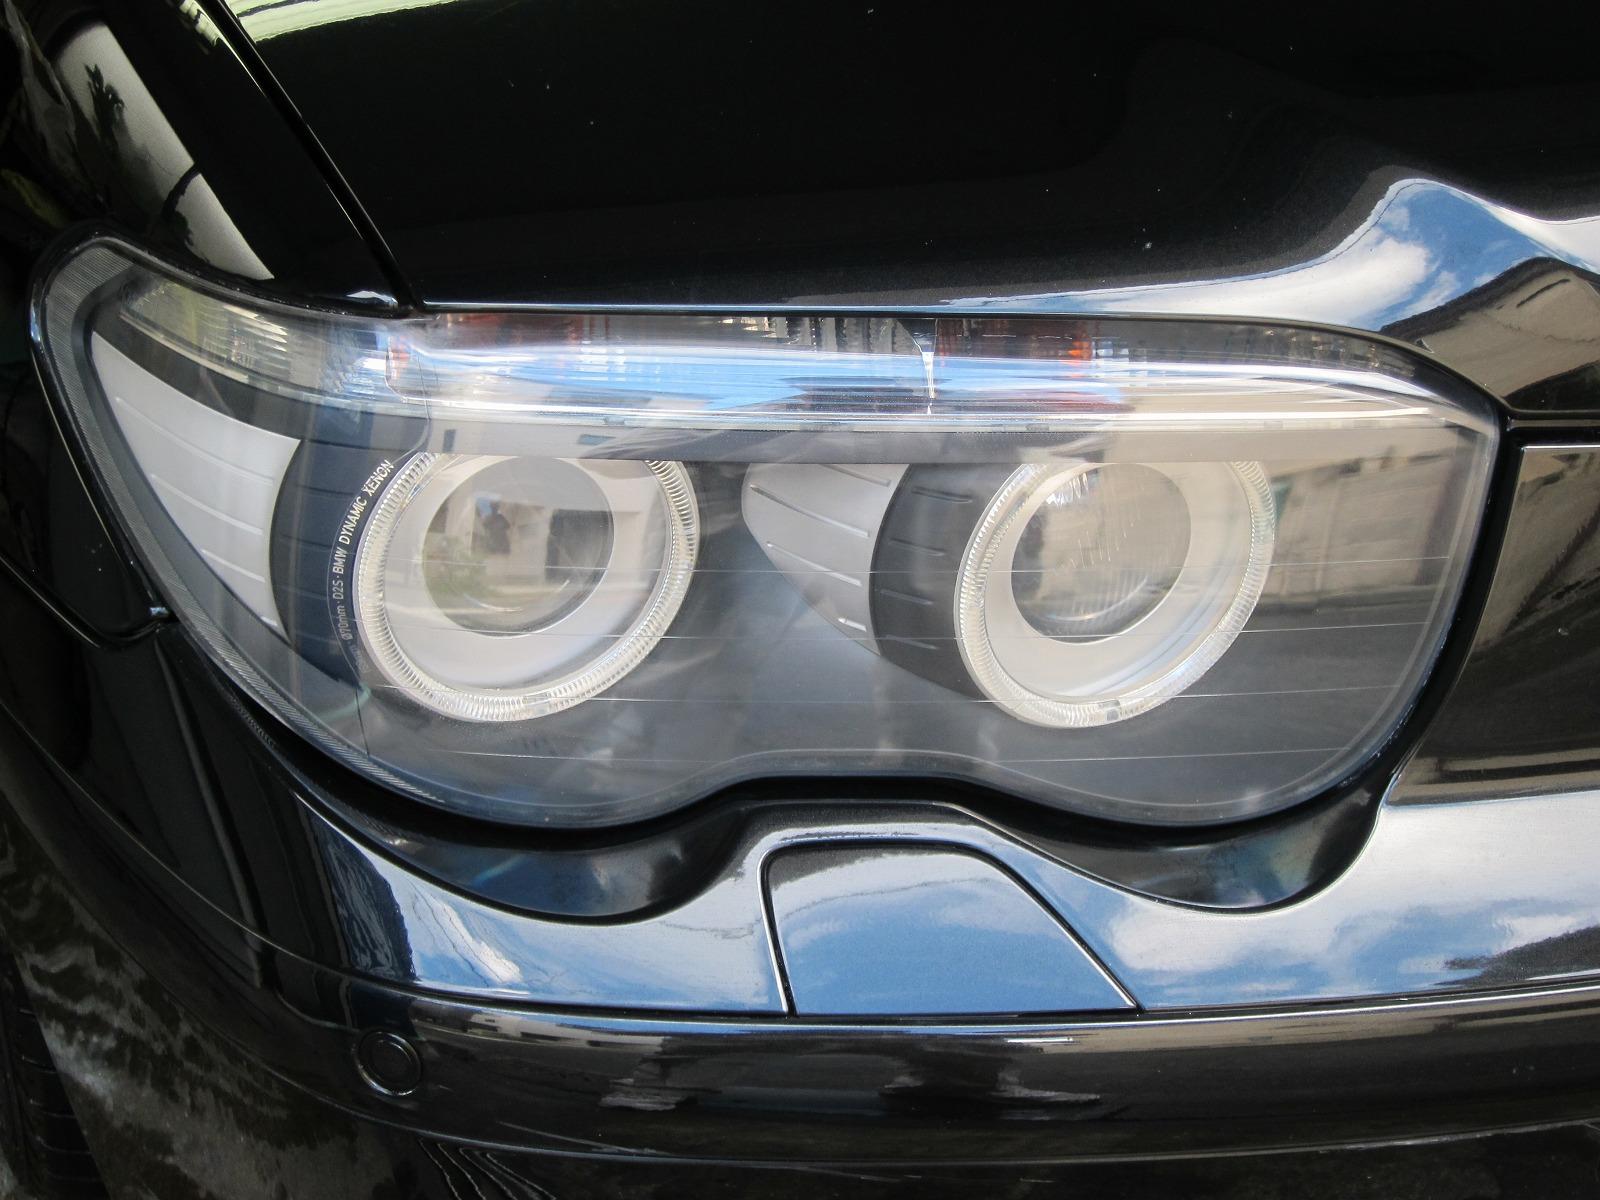 20160518bmw-745i-headlight-cleaning-09